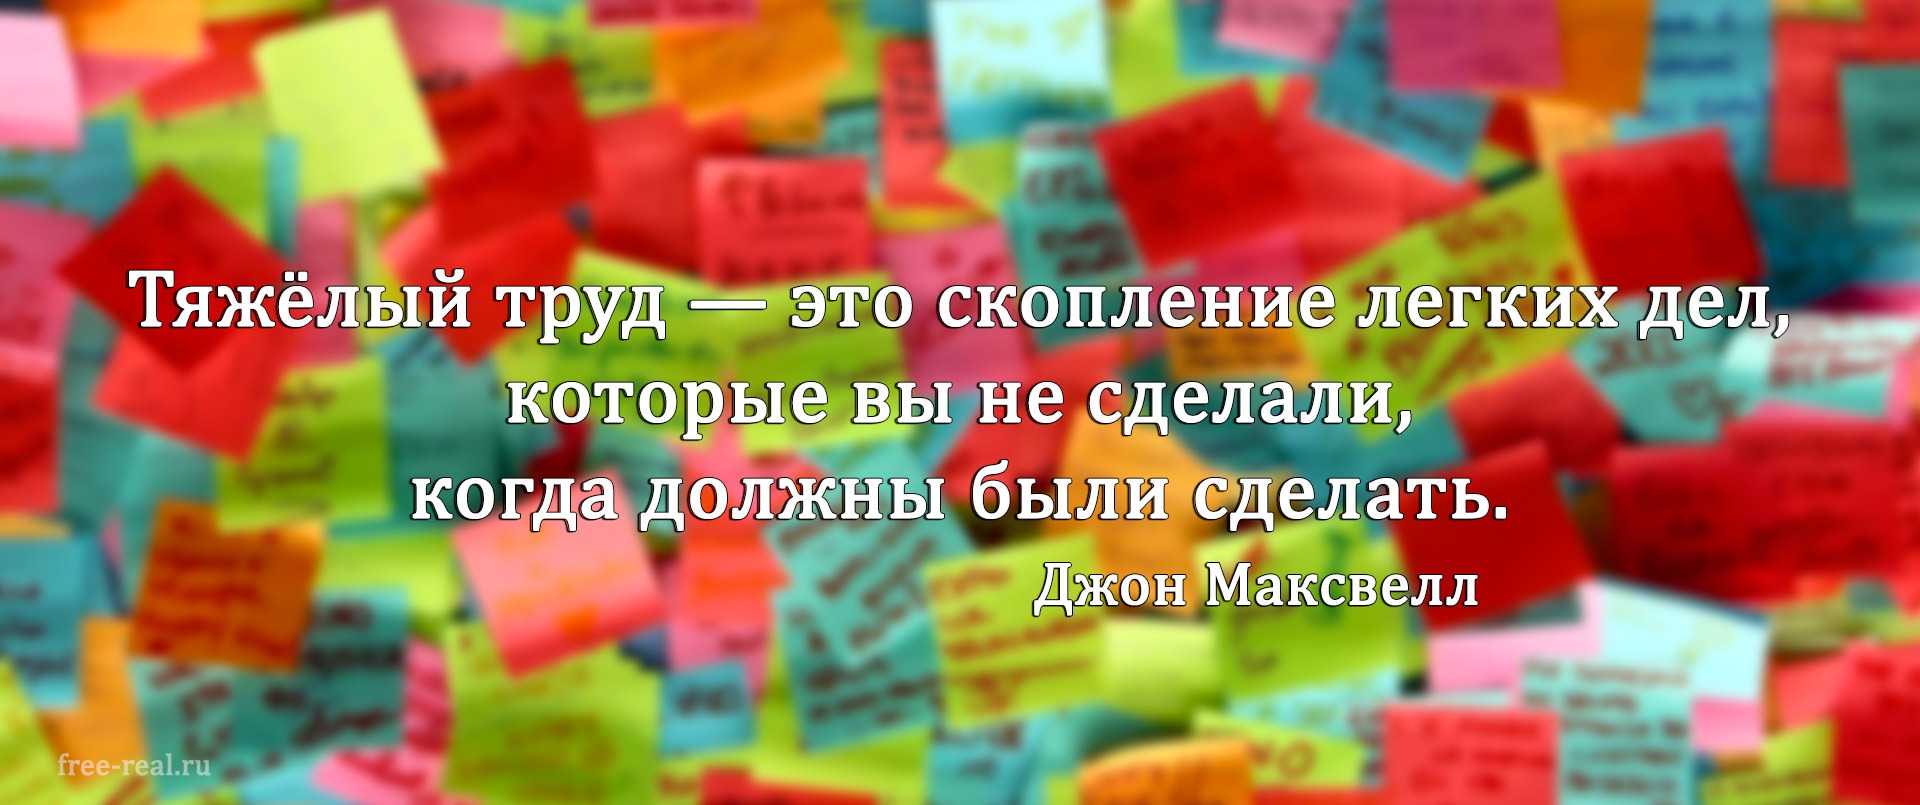 максвел цитаты, максвелл цитаты, цитаты про успех, мотивация успеха, мотивирующие картинки